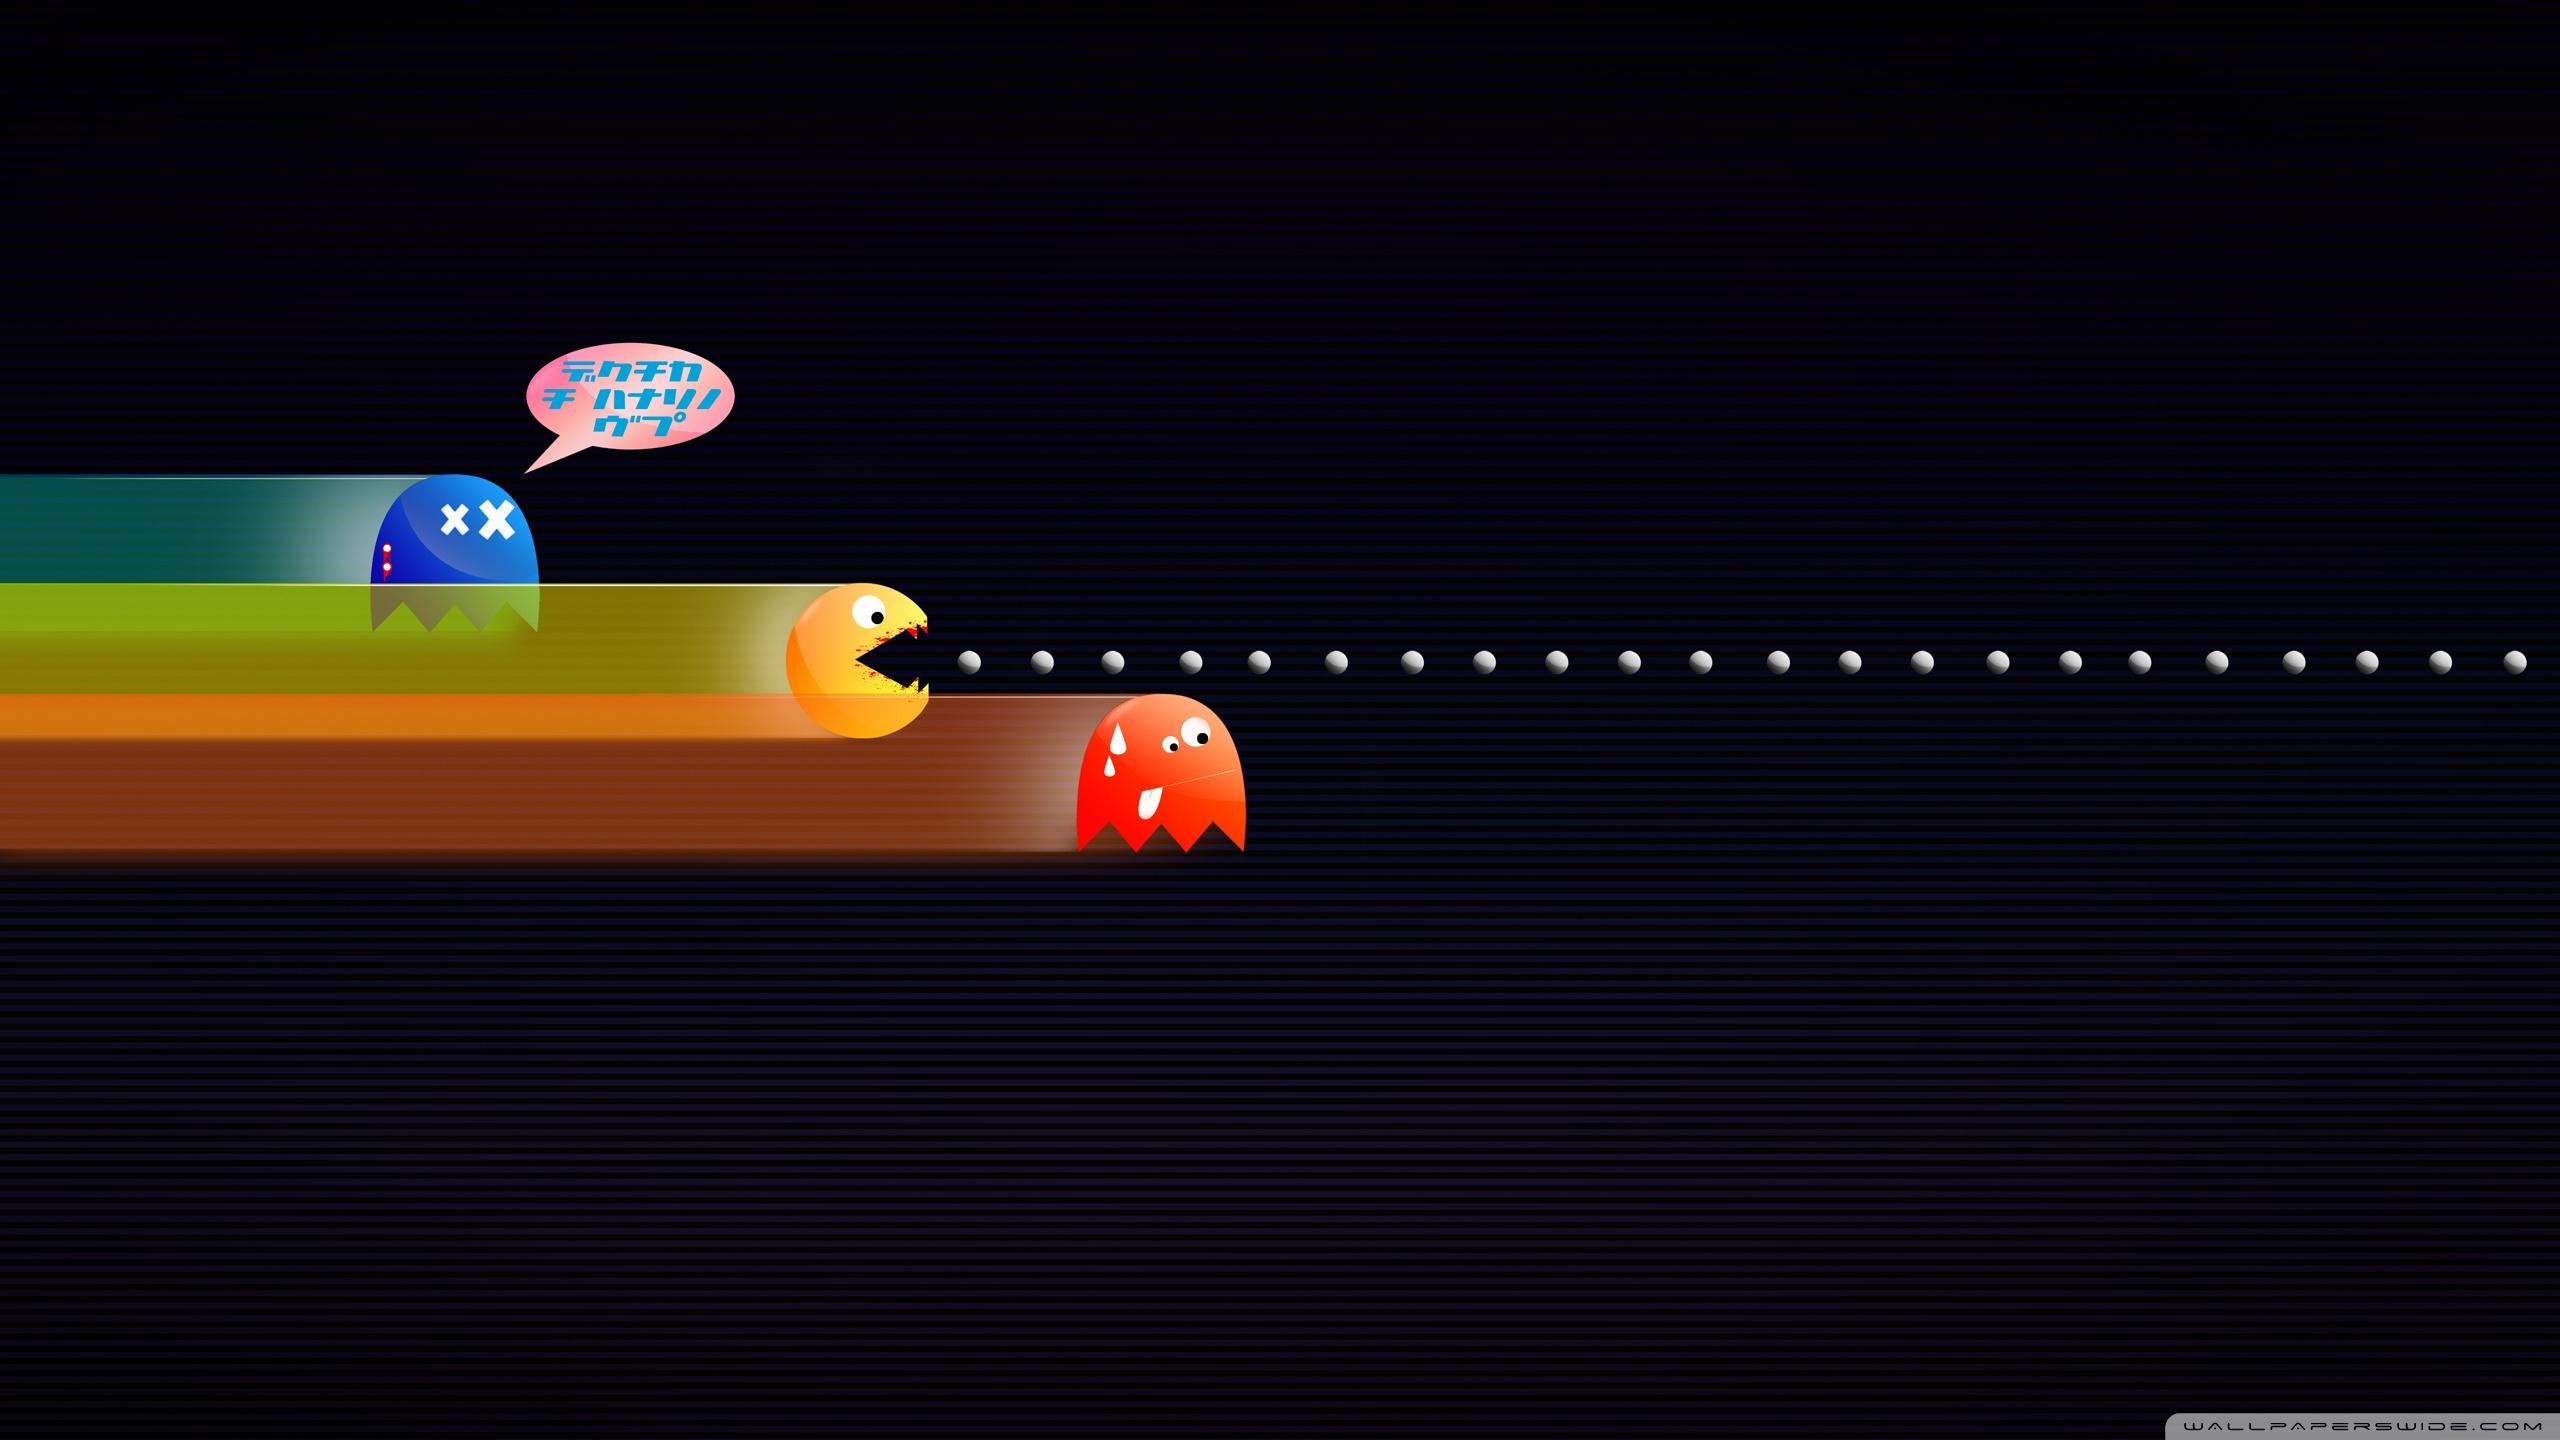 Live Wallpaper Dragon Ball Iphone X Funny Pacman 4k Hd Desktop Wallpaper For 4k Ultra Hd Tv